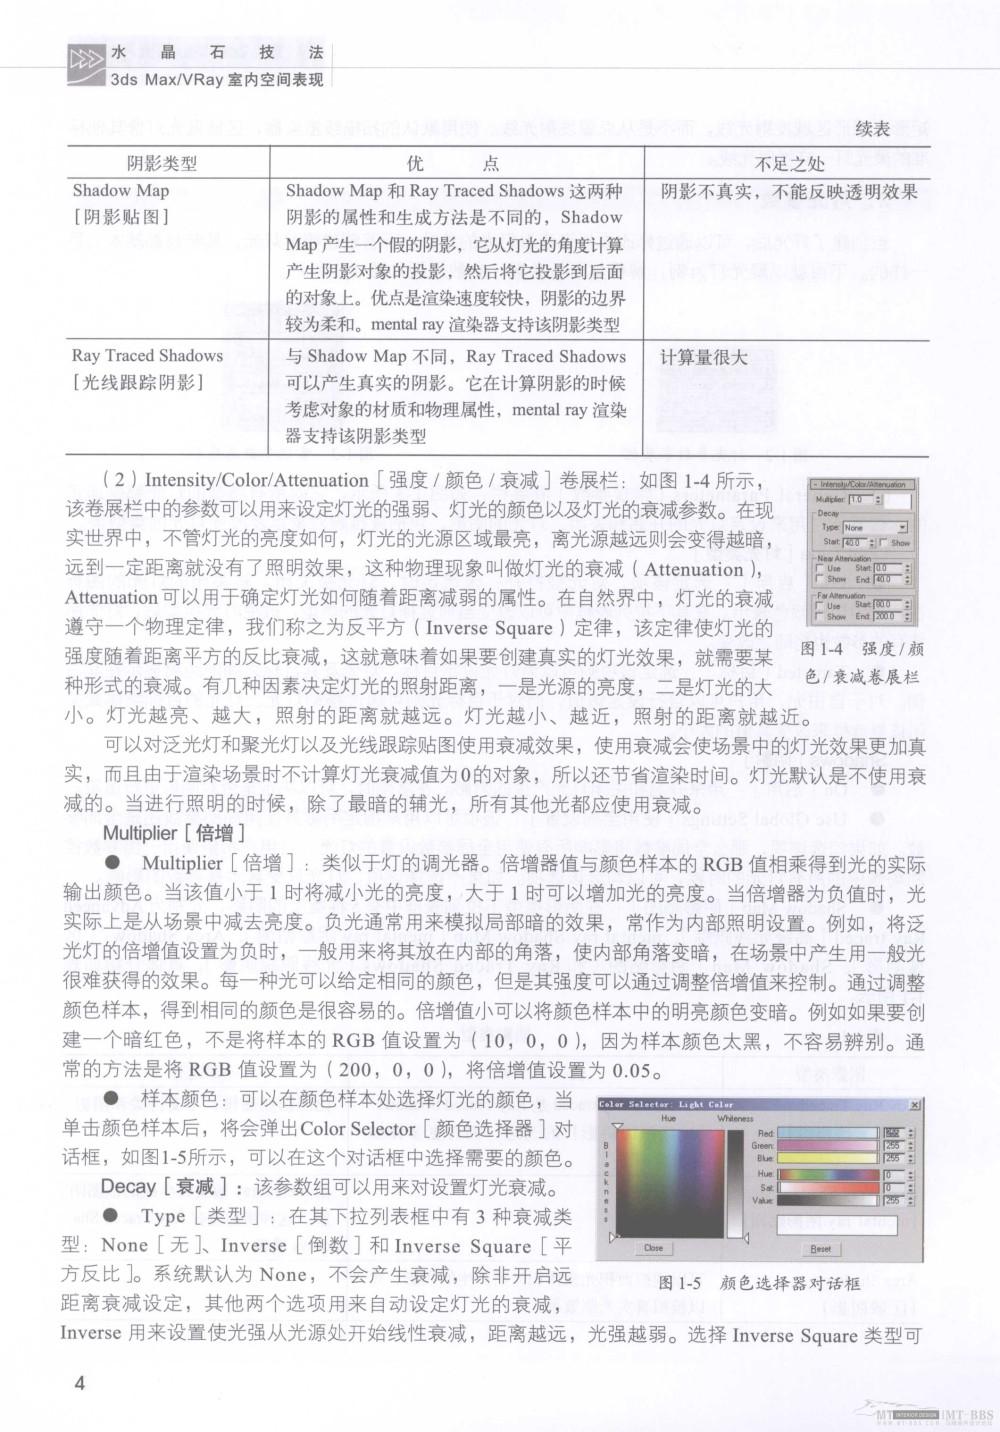 水晶石技法-3ds_Max&VRay室内空间表现_水晶石技法-3ds_Max&VRay室内空间表现_页面_010.jpg